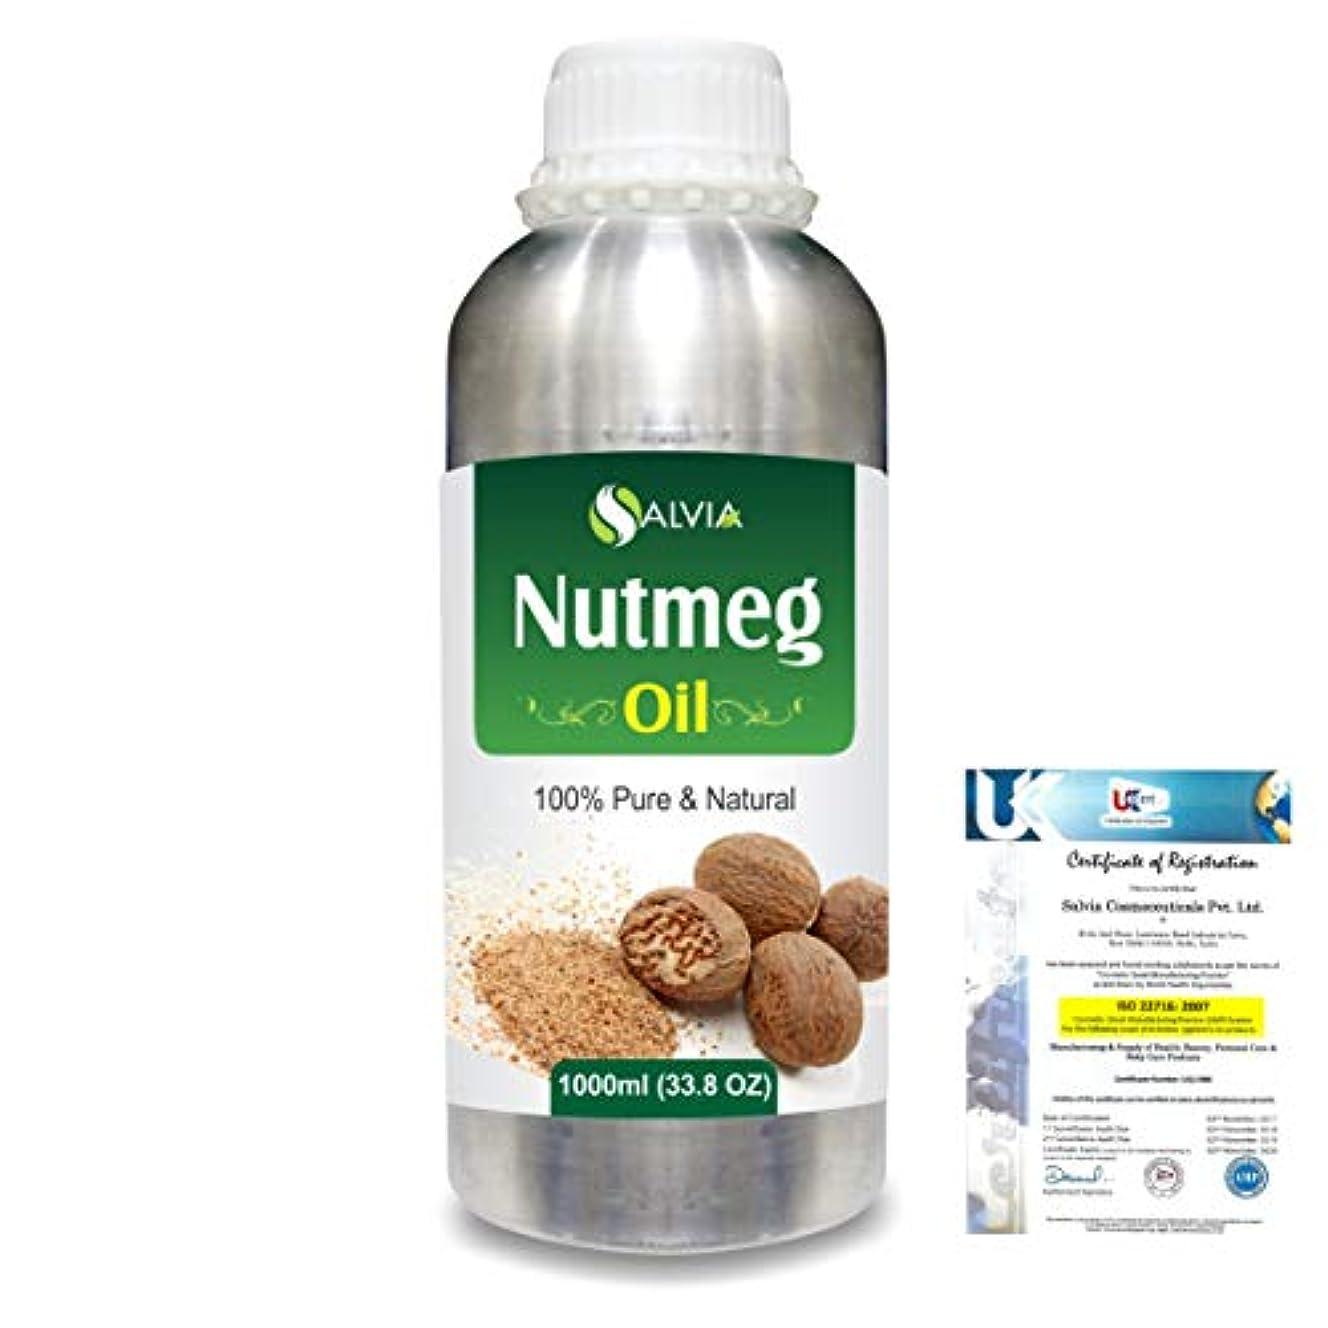 キャリア正統派共産主義者Nutmeg (Myristica fragrans) 100% Natural Pure Essential Oil 1000ml/33.8fl.oz.